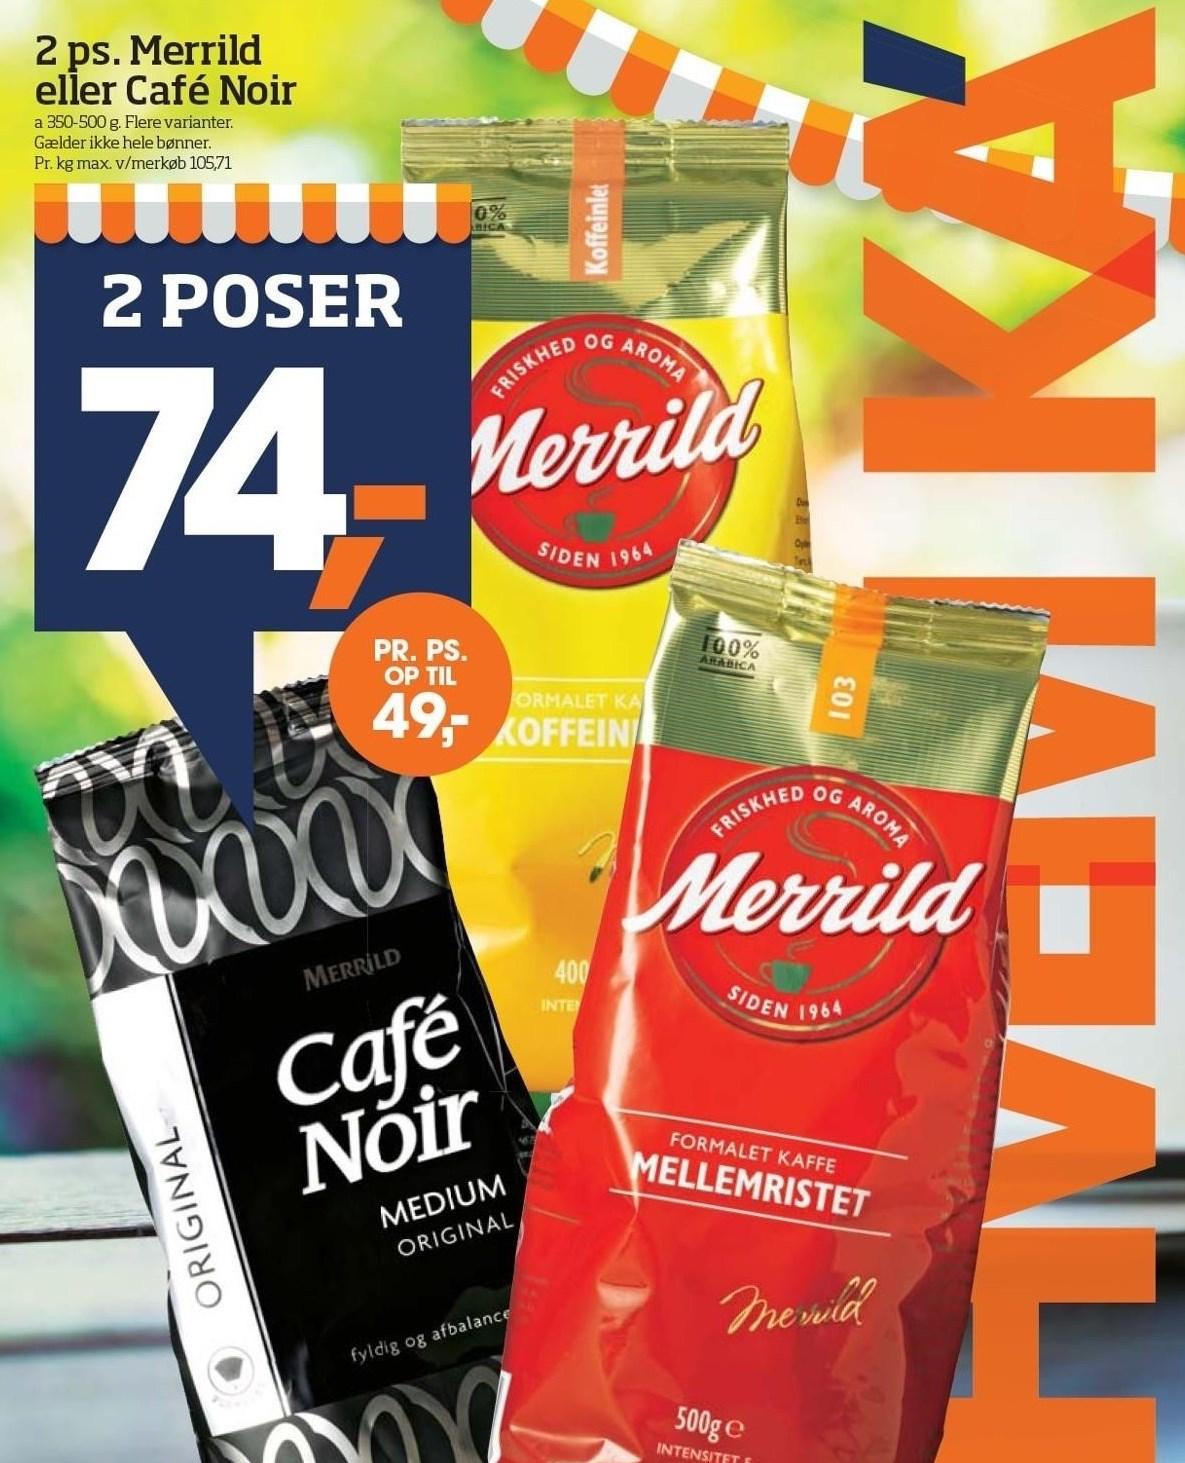 2 ps. Merrild eller Café Noir